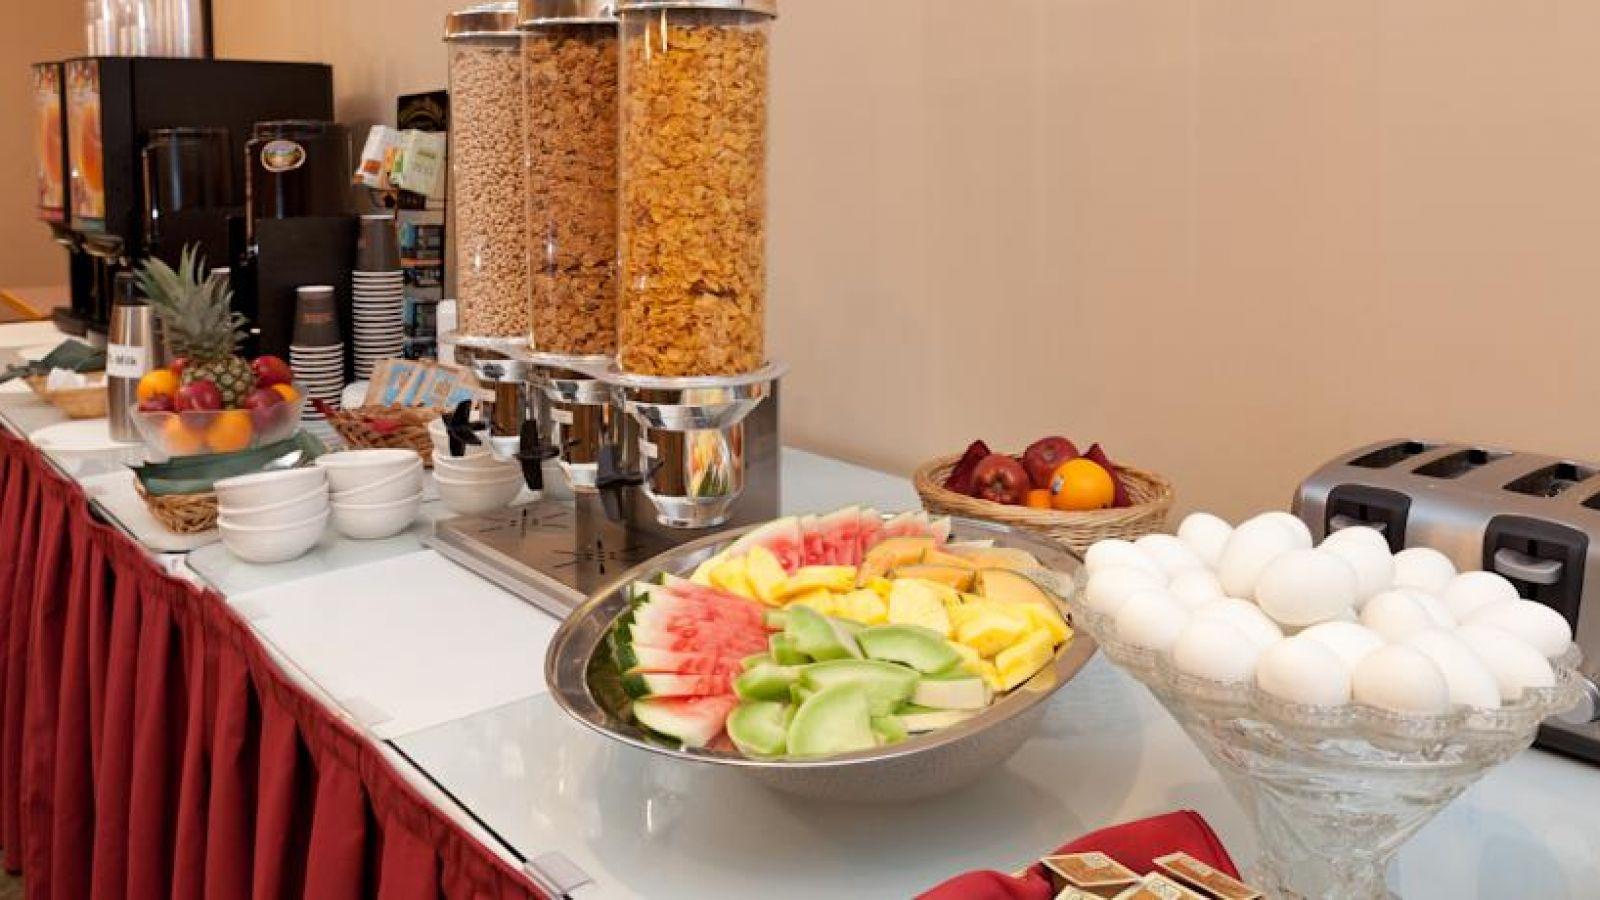 Royal Anne Hotel Kelowna - breakfast bar